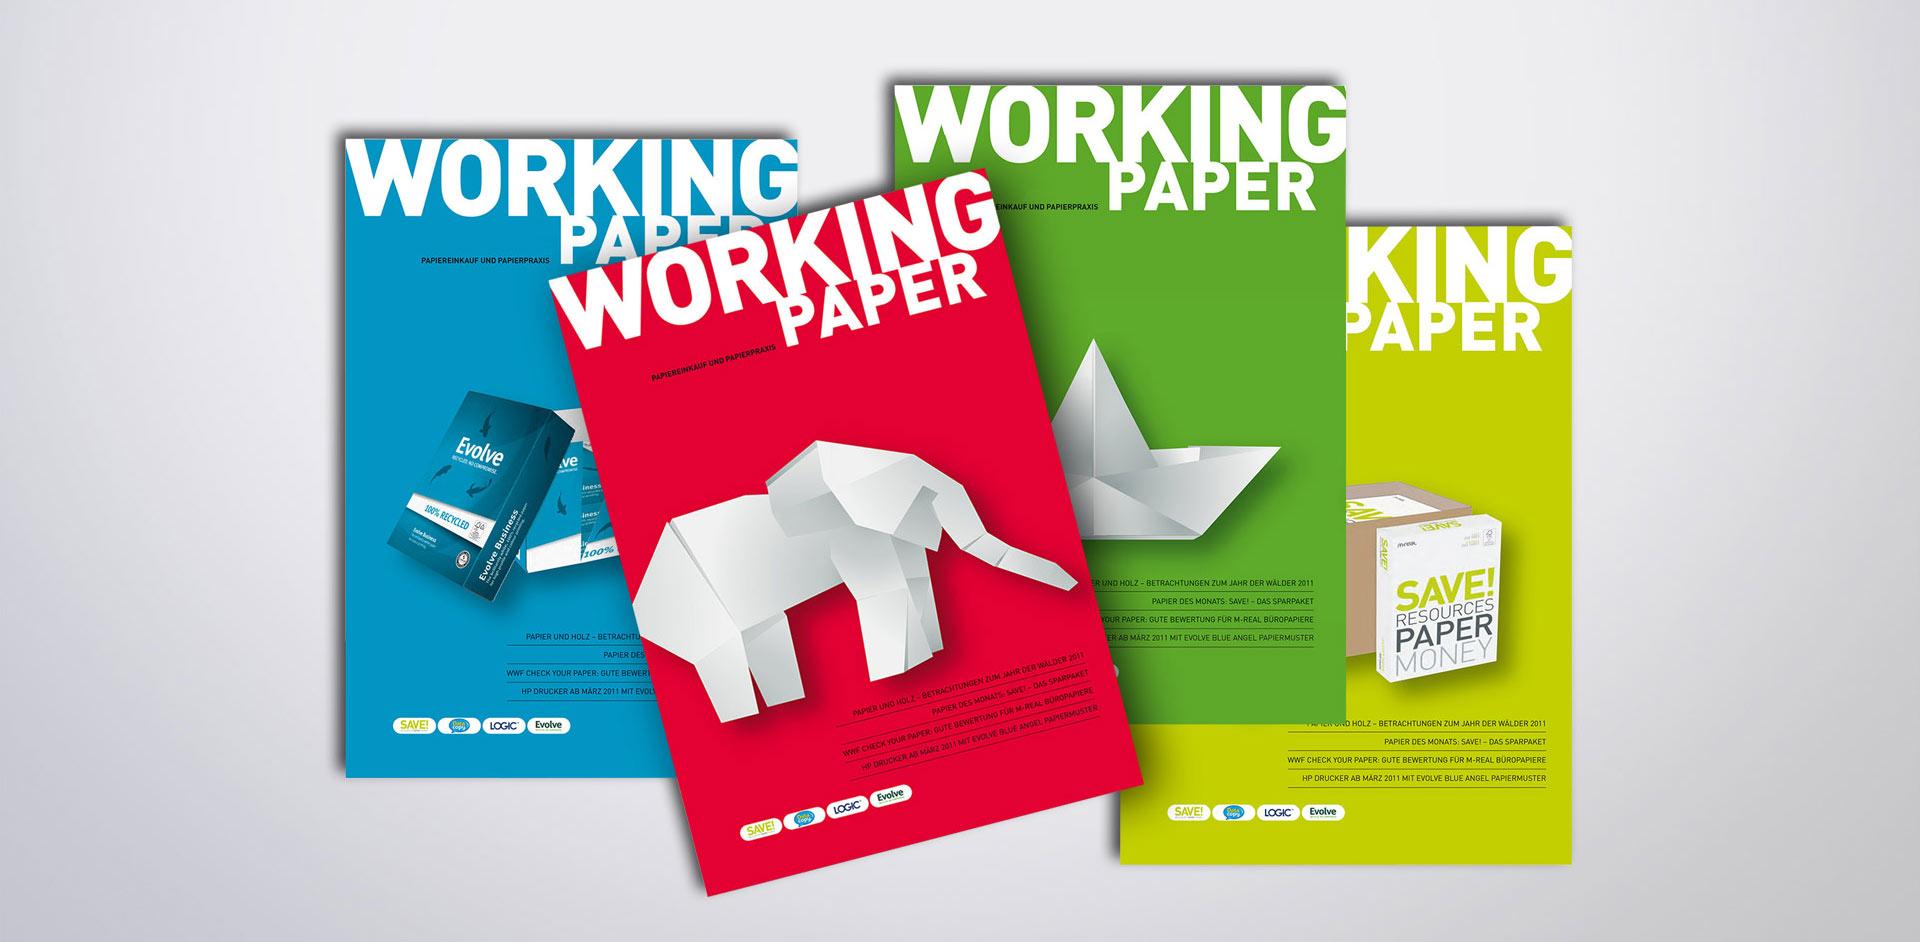 Metsä Board - Publikation für Fachhandel